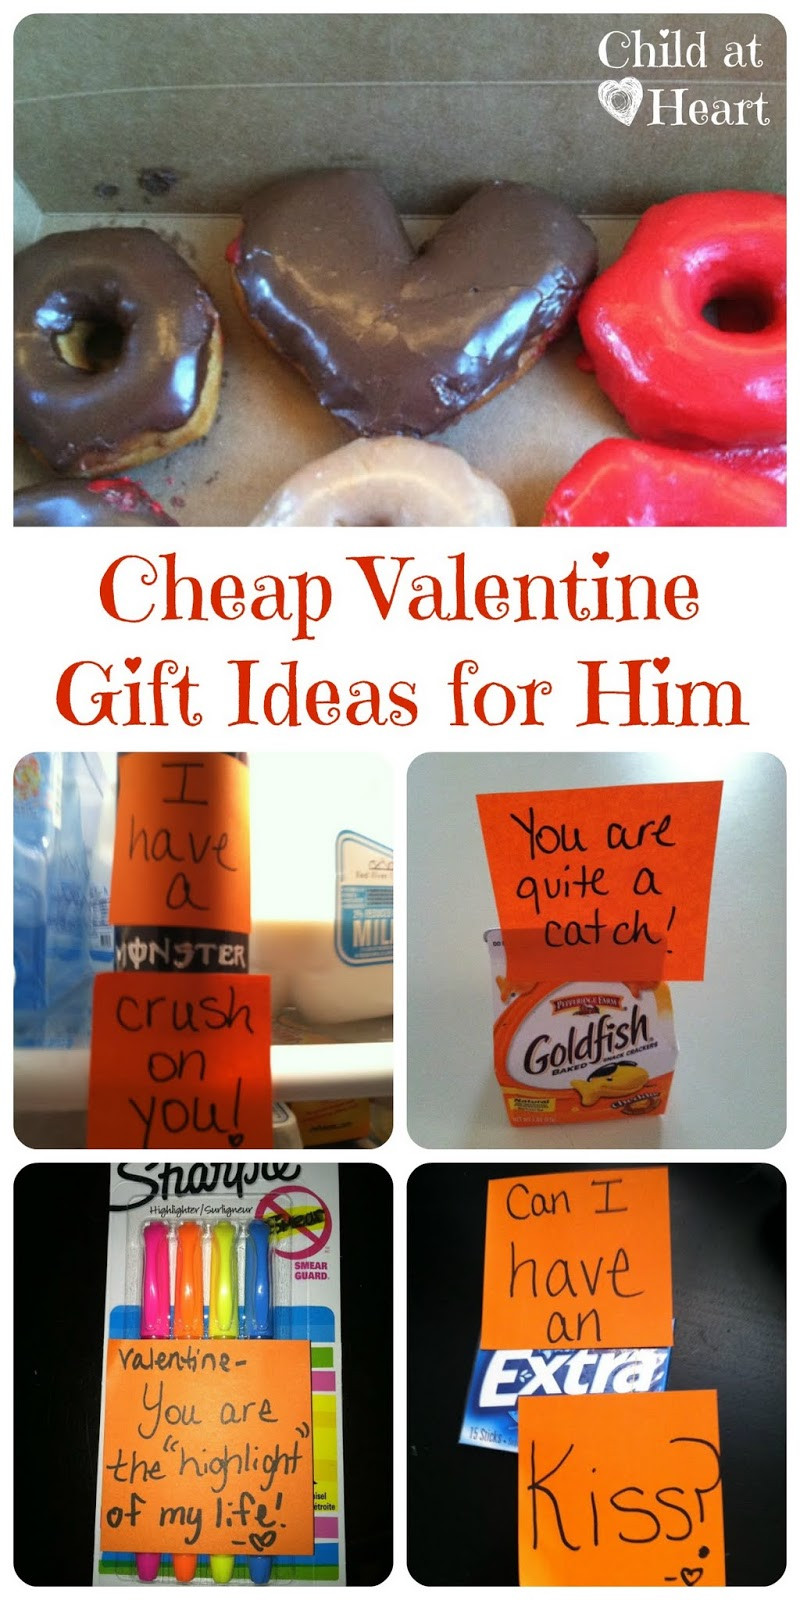 Valentines Gift Ideas For Your Boyfriend  Cheap Valentine Gift Ideas for Him Child at Heart Blog